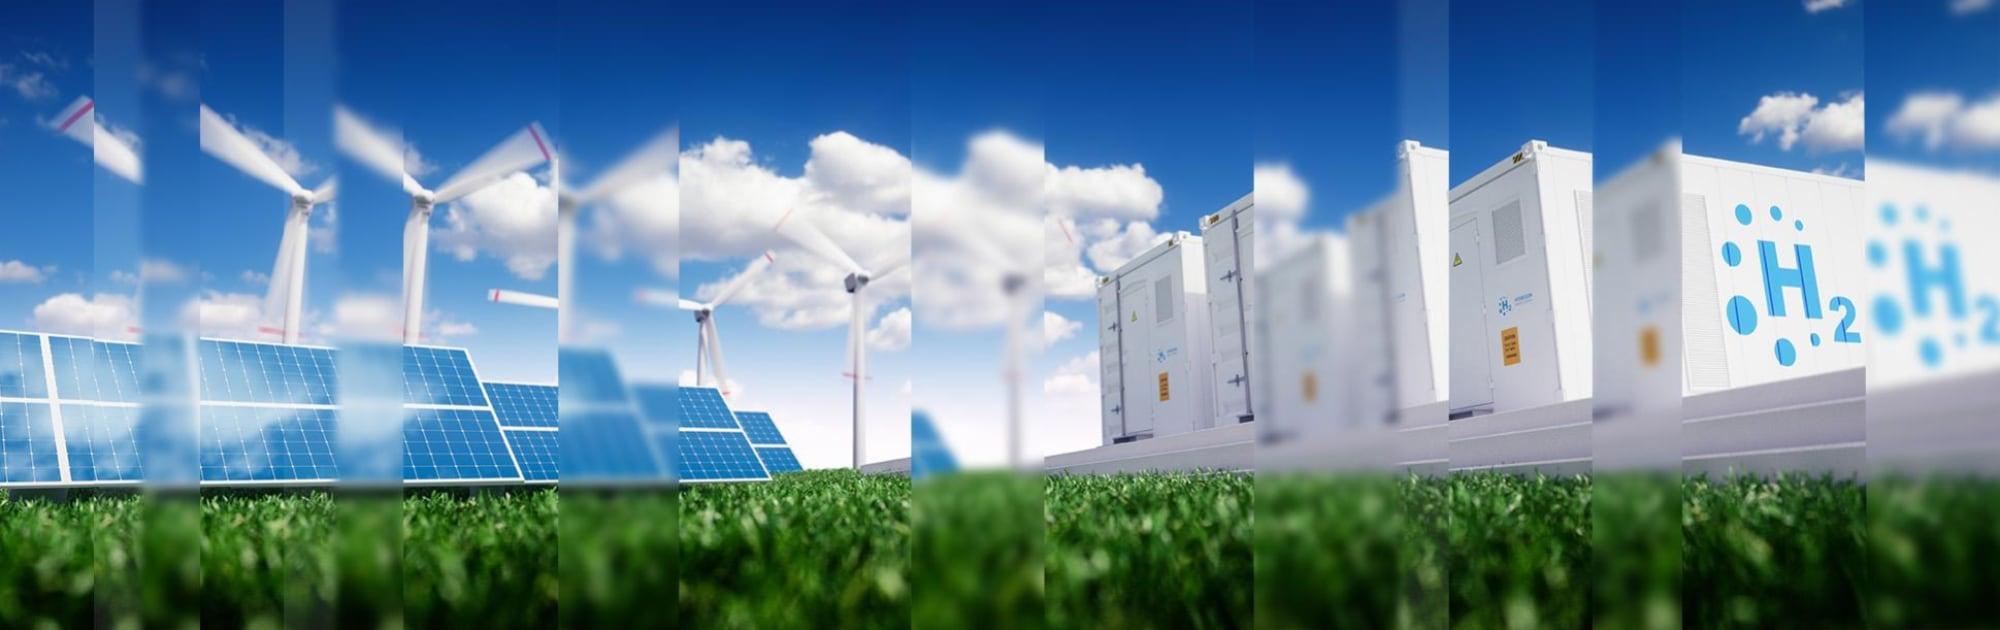 Solar, Wind and Hydrogen Power